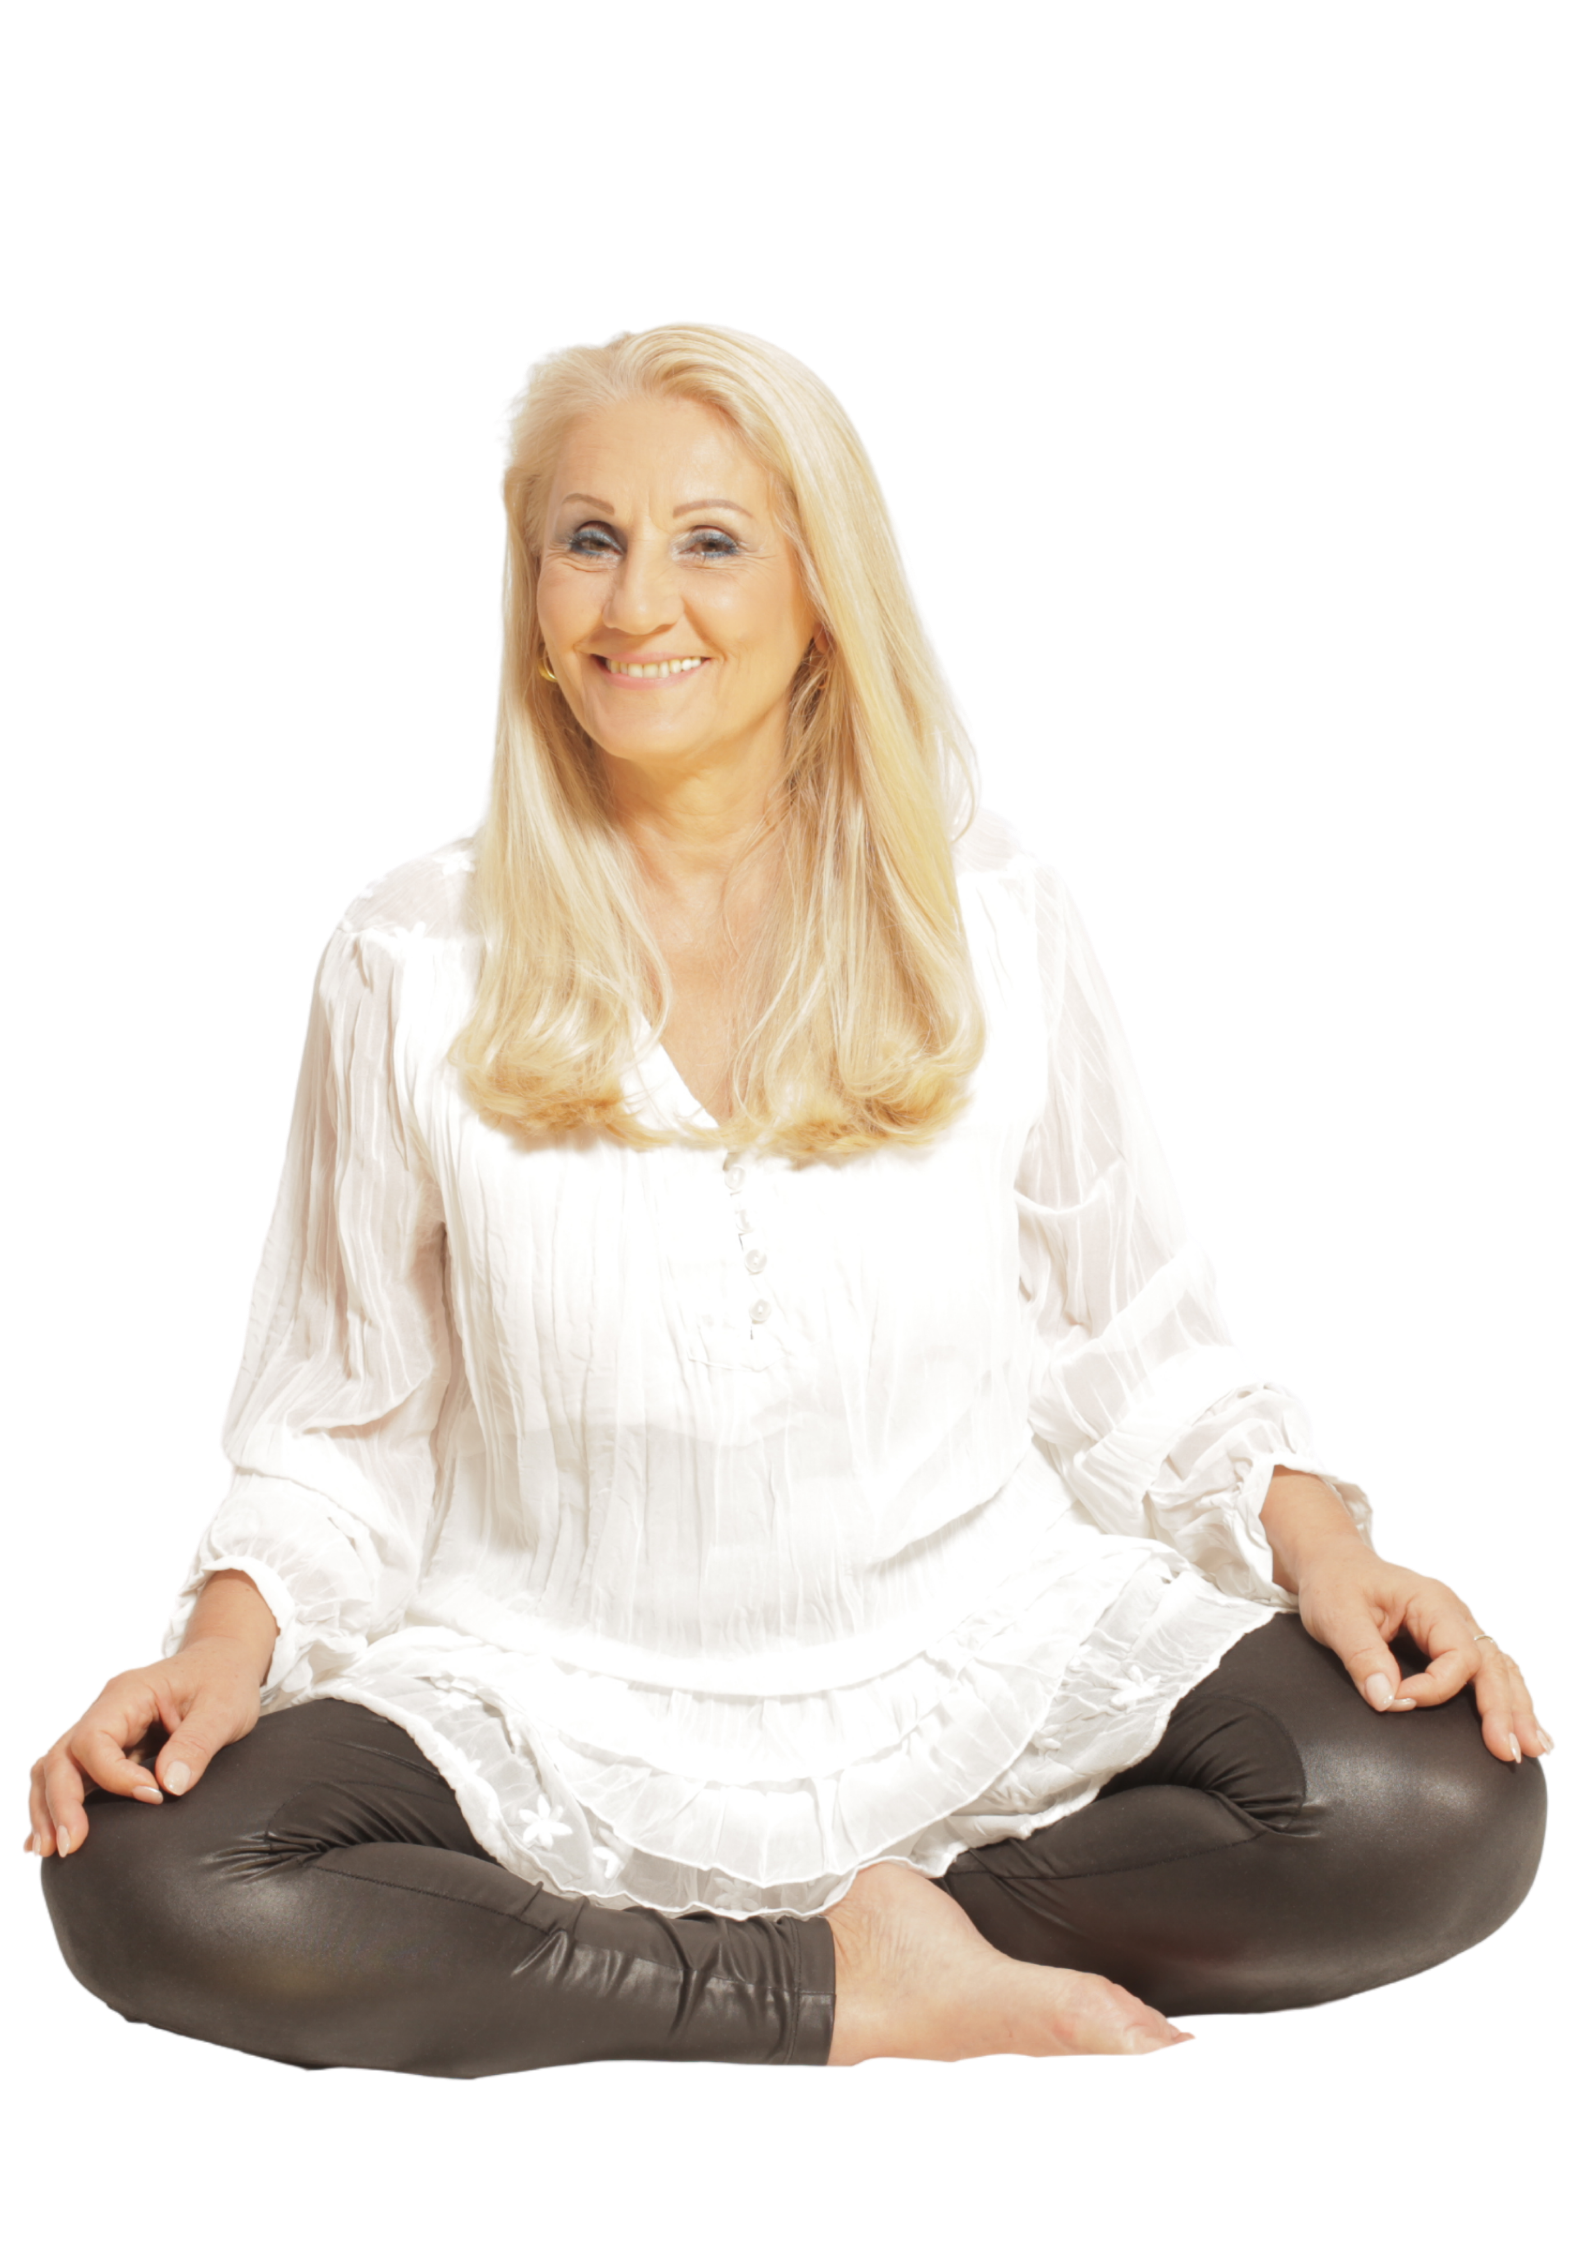 Dragica yoga